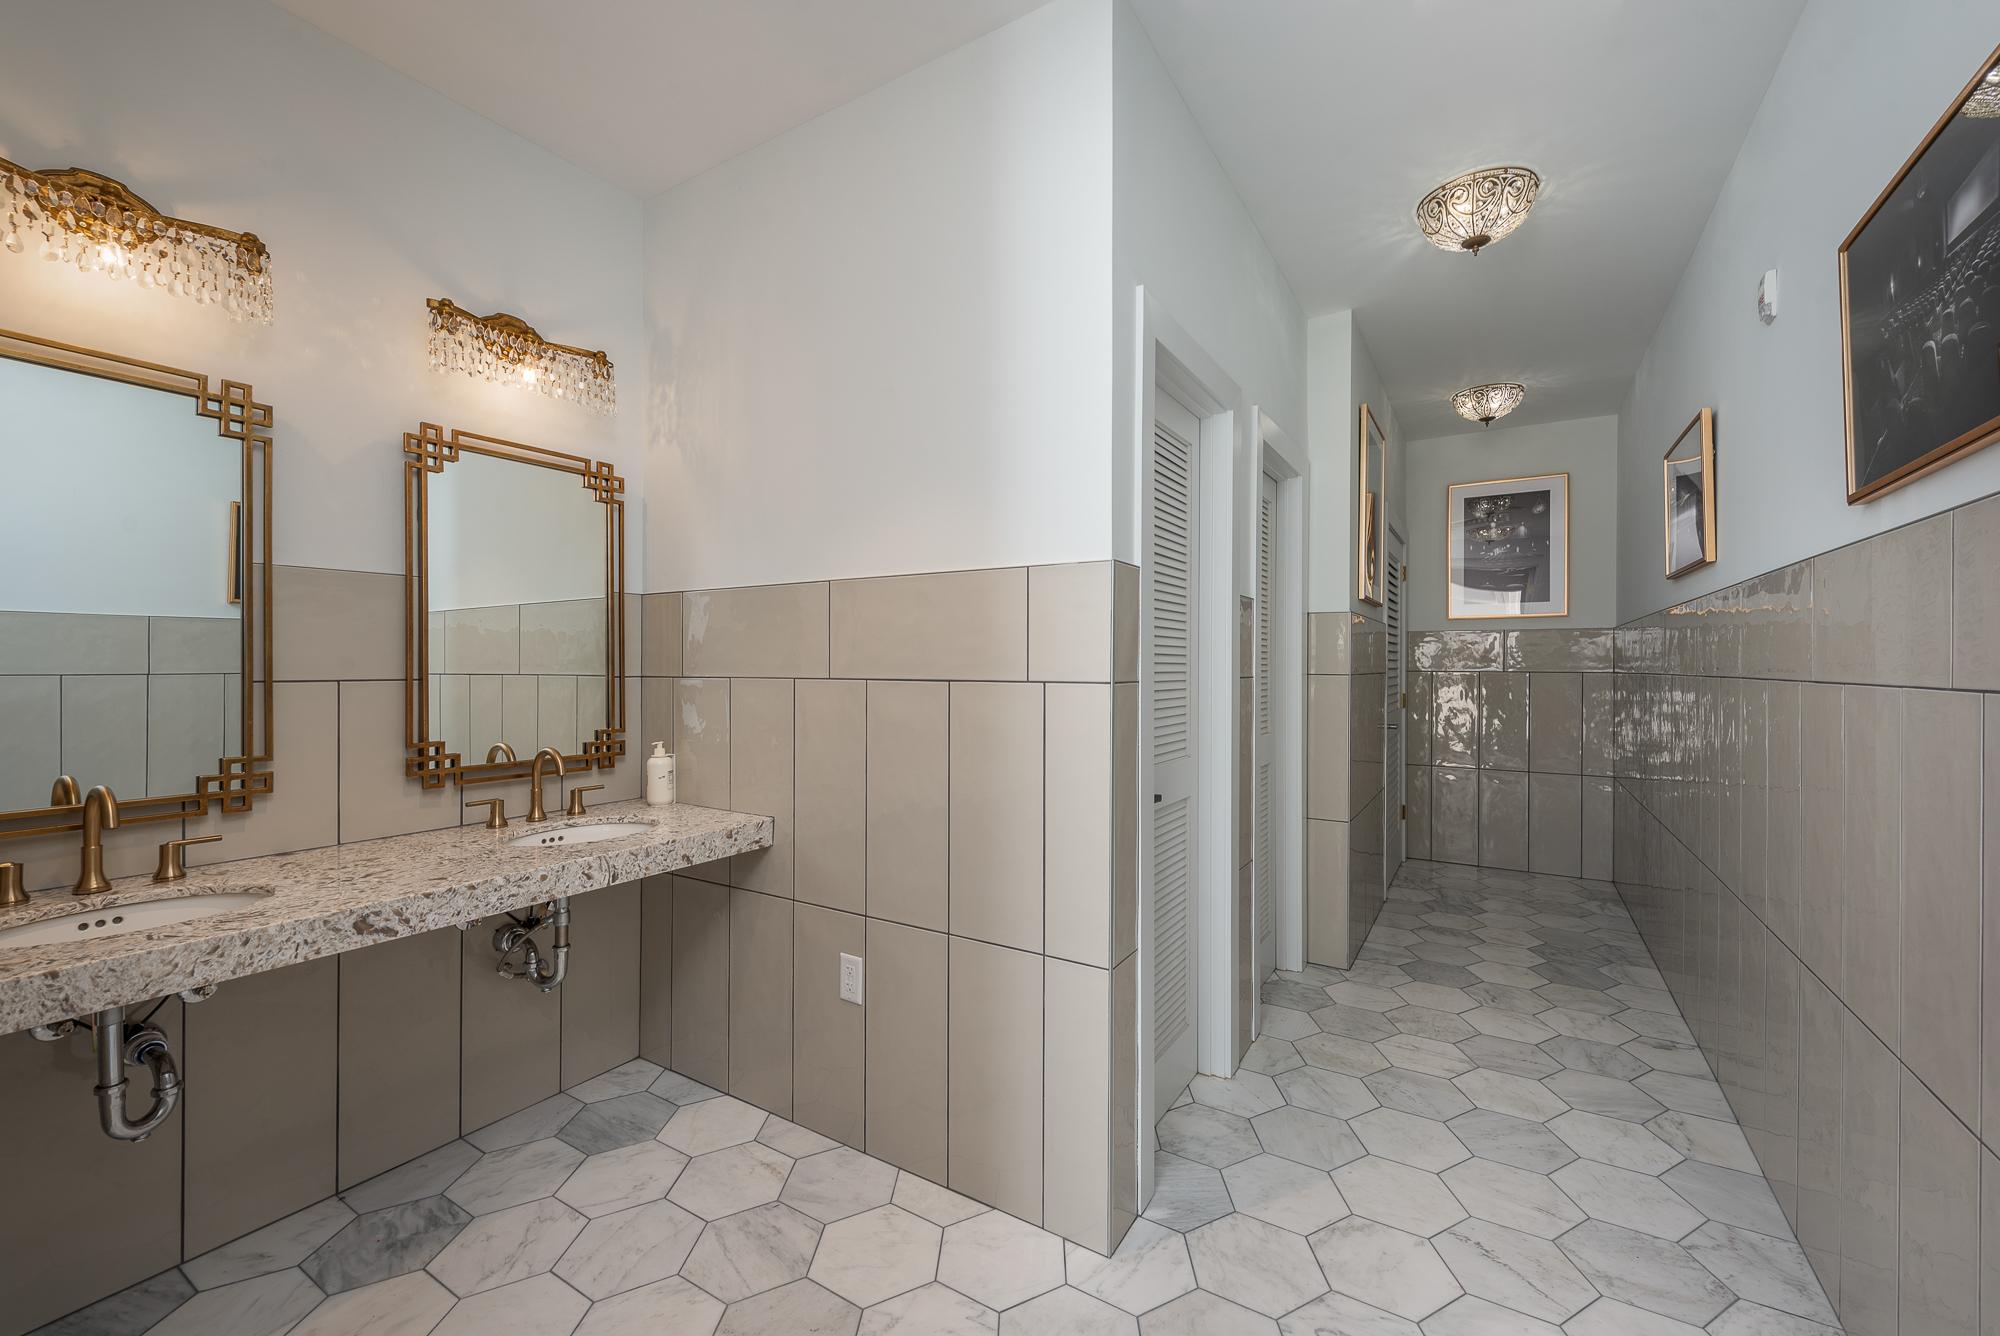 Micamy Design Studio_Interior Design_Clay Theatre_Event Space_Venue_Wedding_Art Deco_Modern_Marble Tile_Decorative Tile_Bathroom_Hexagon_Cambria_Sconce.jpg